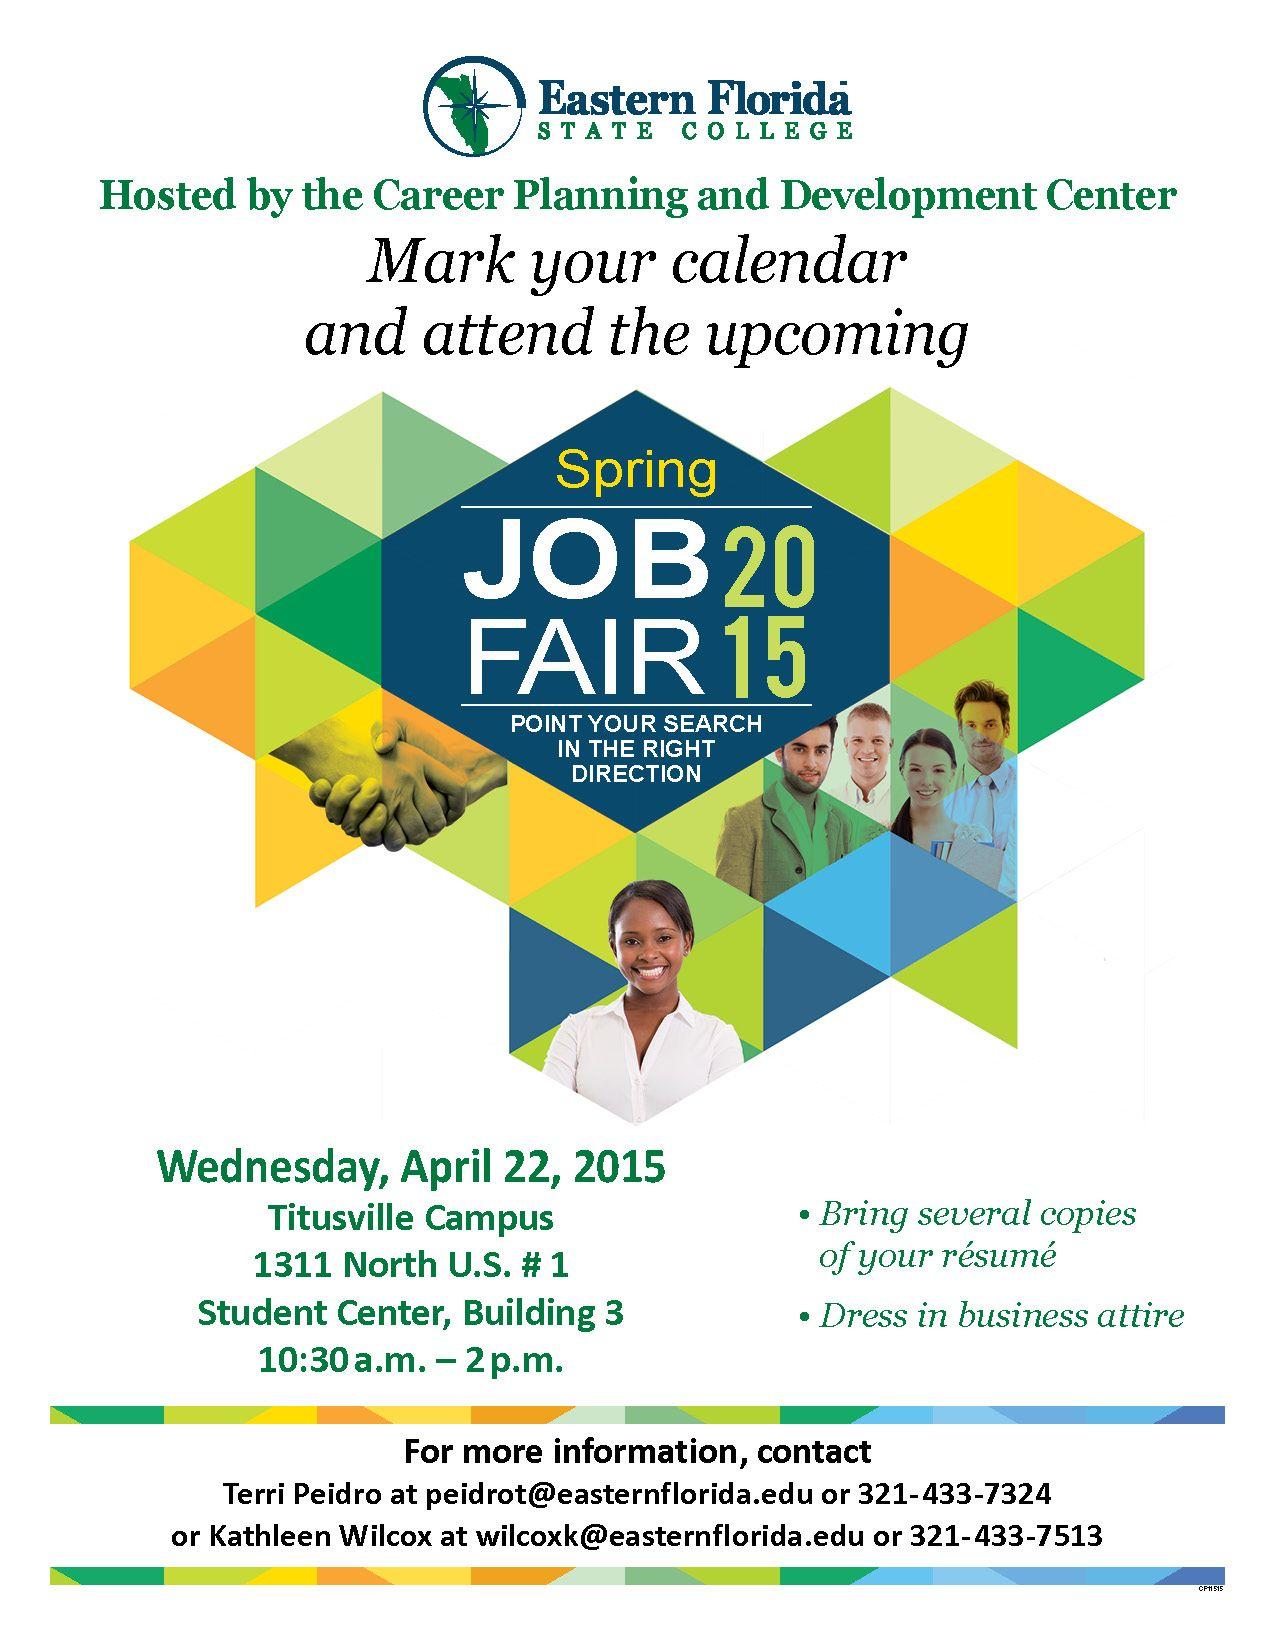 Eastern Florida State College job fair information Job